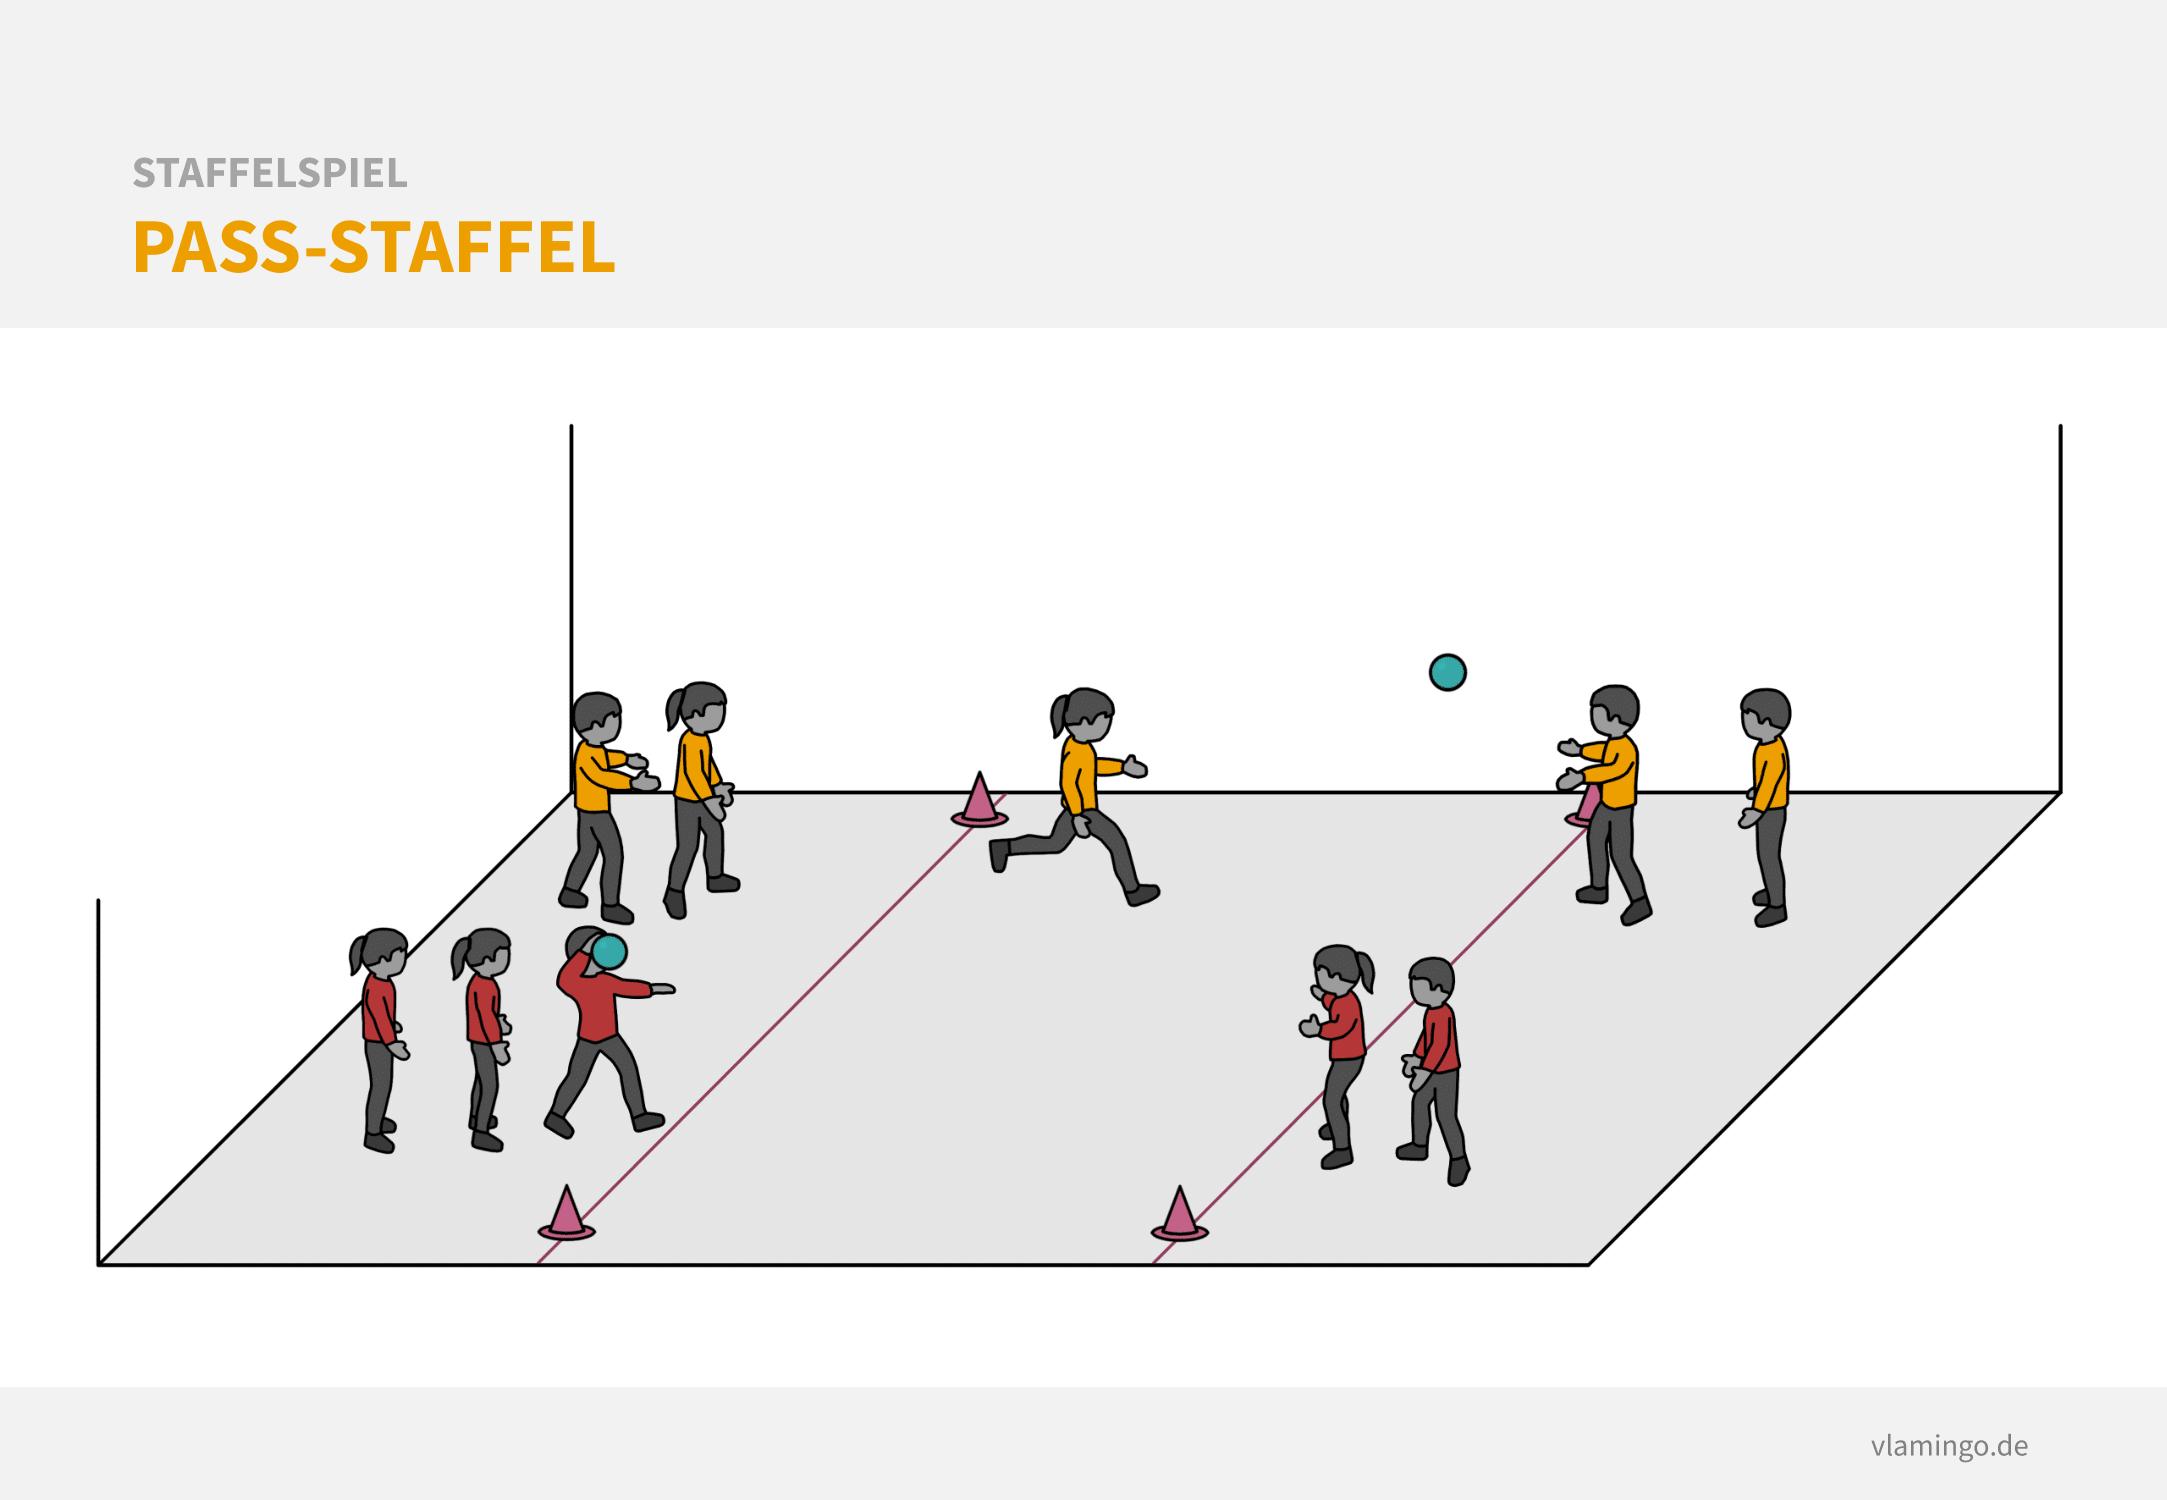 Staffelspiel - Pass-Staffel